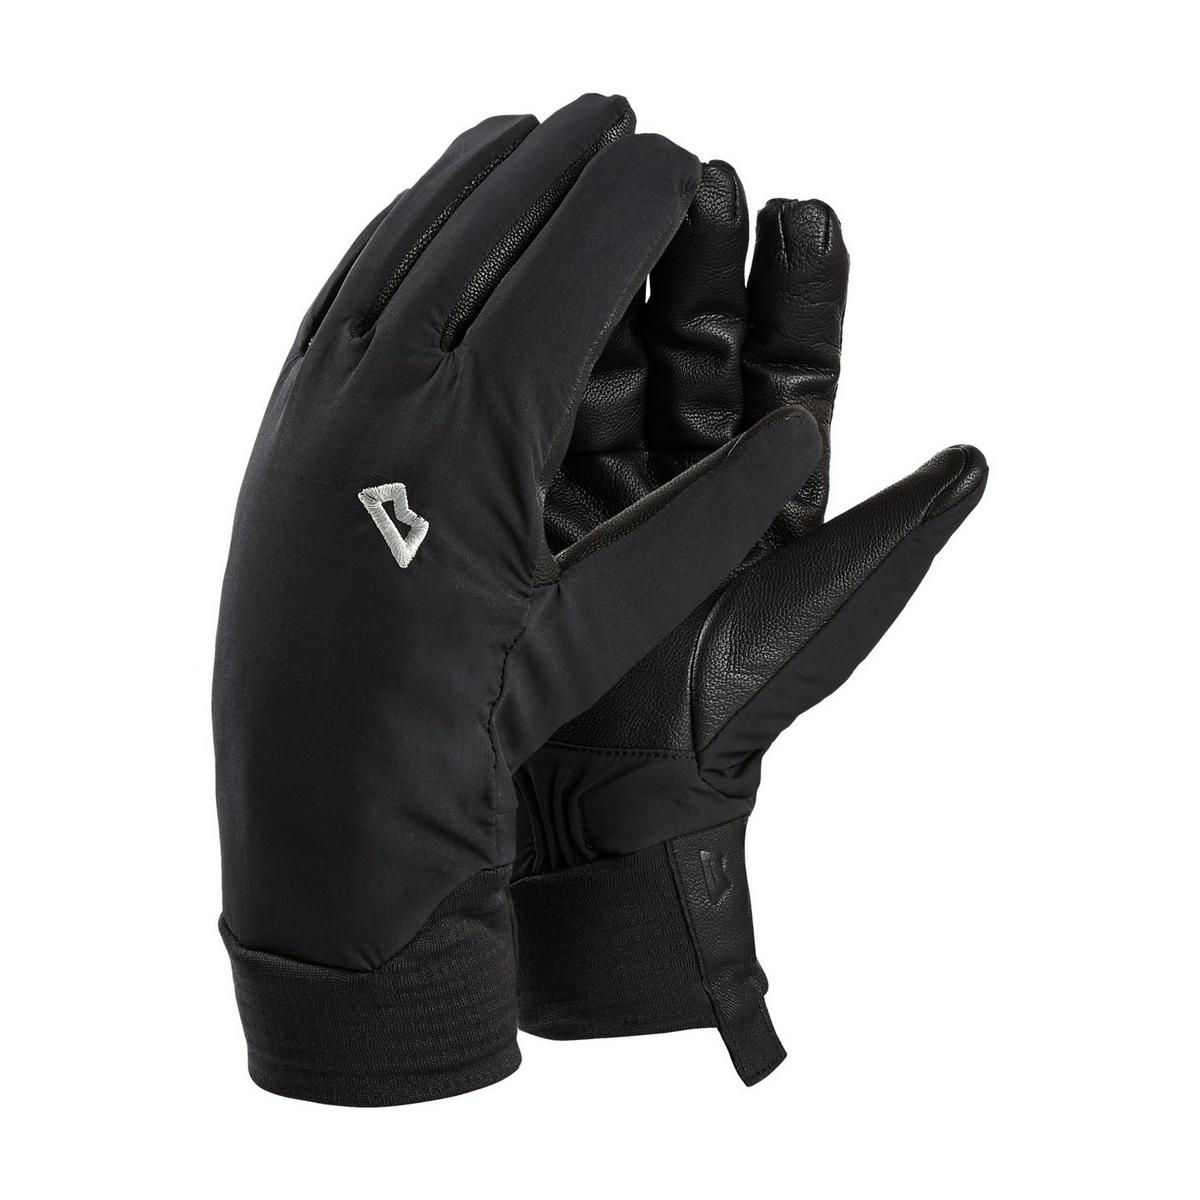 Mountain Equipment Men's Mountain Equipment Tour Glove - Black